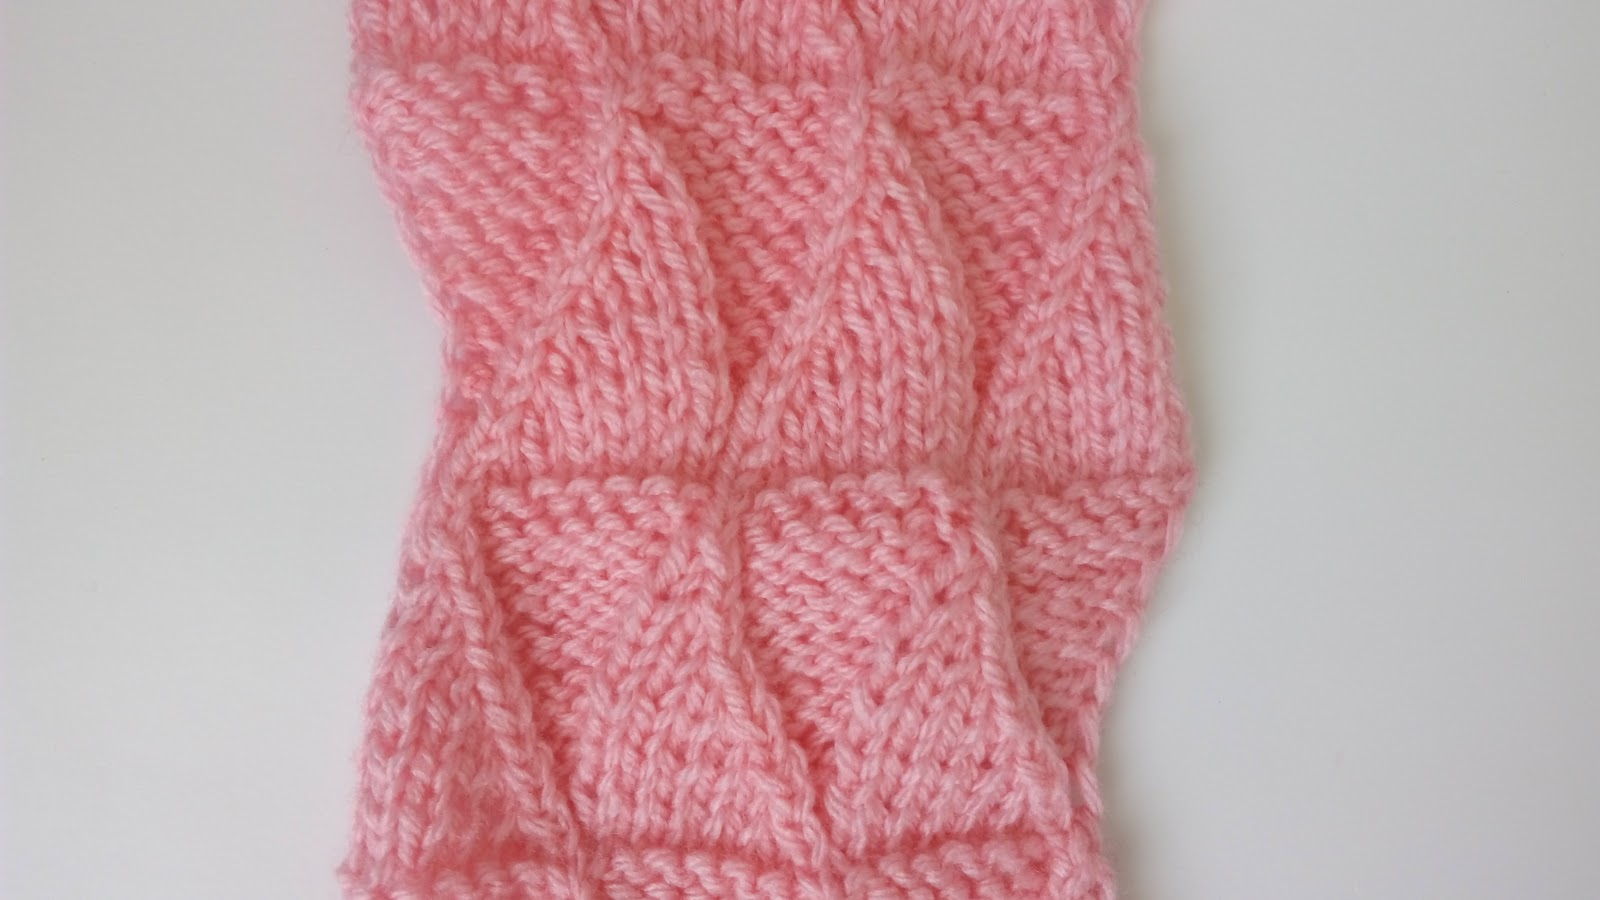 Fake Entrelac - Knitting Stitch